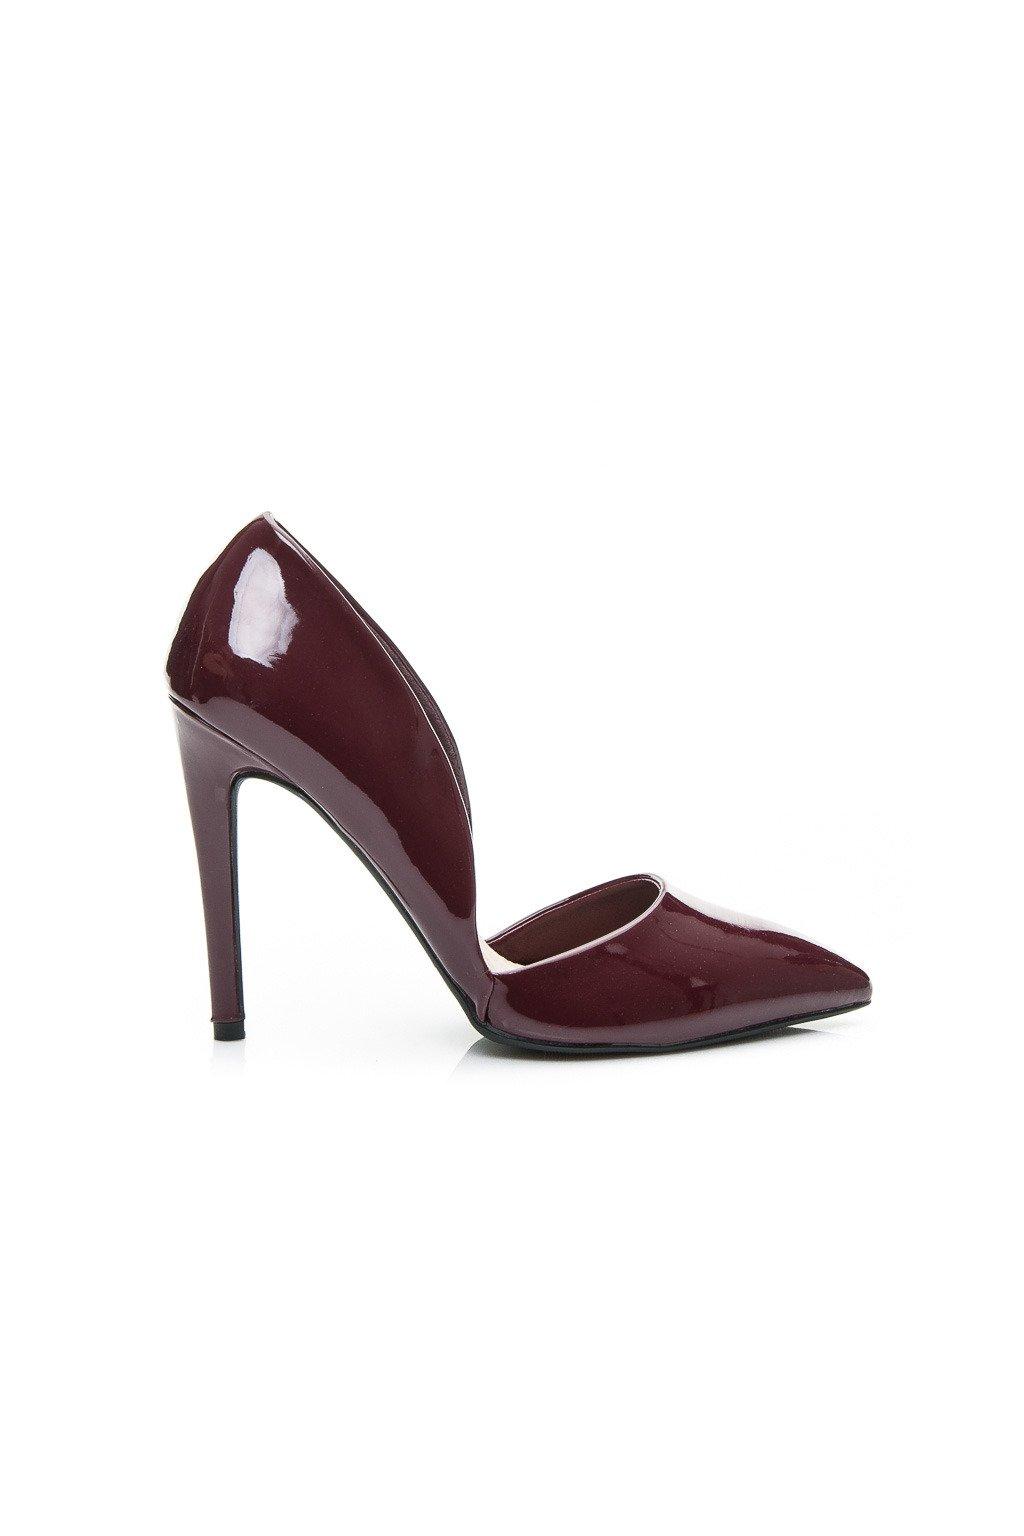 d81a9f13c44d9 Dámska obuv - Topánky